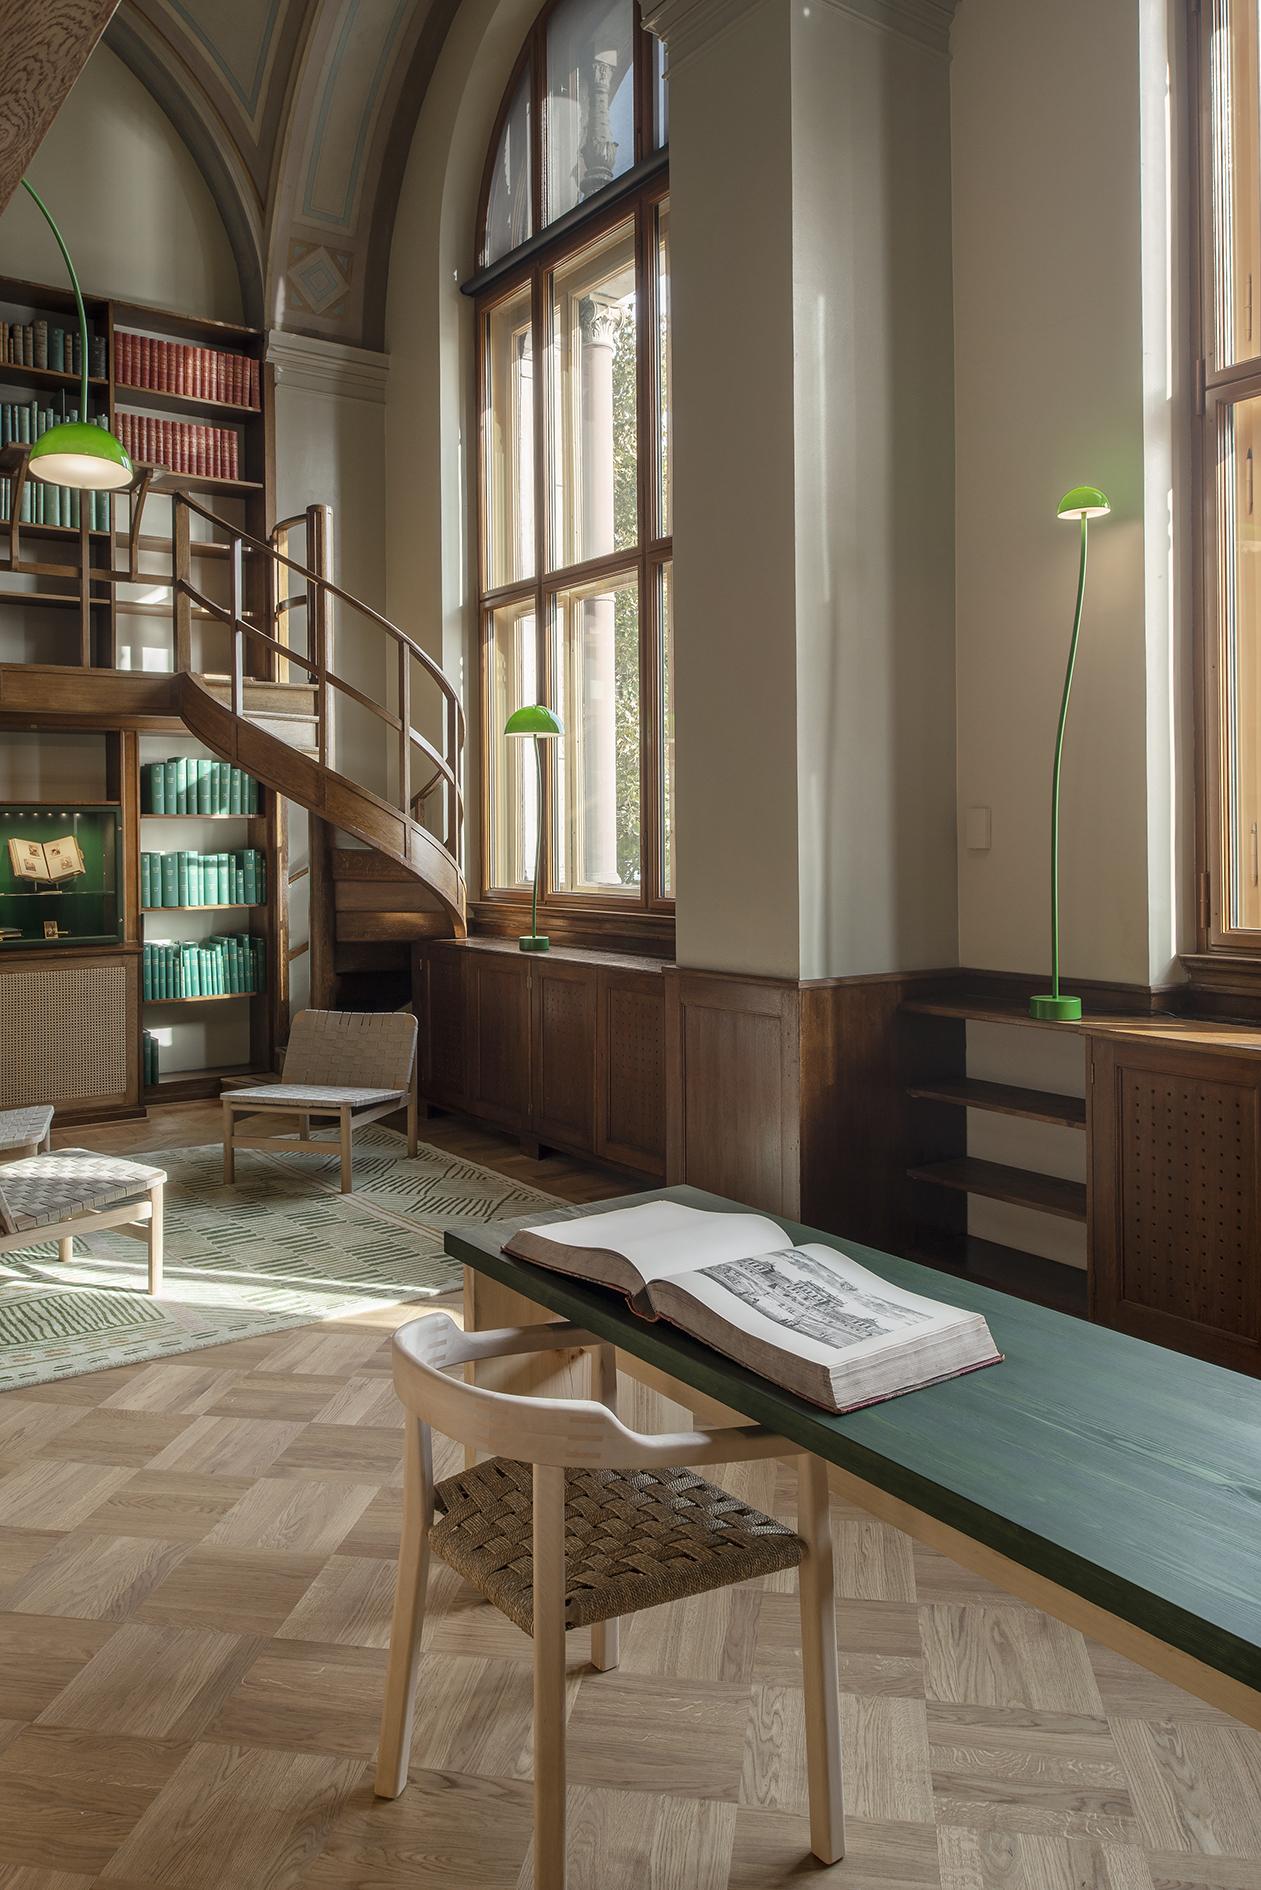 Curve - Fixture: Curve Floor and TableProject: Nationalmuseum StockholmDesigner: Fron Design.